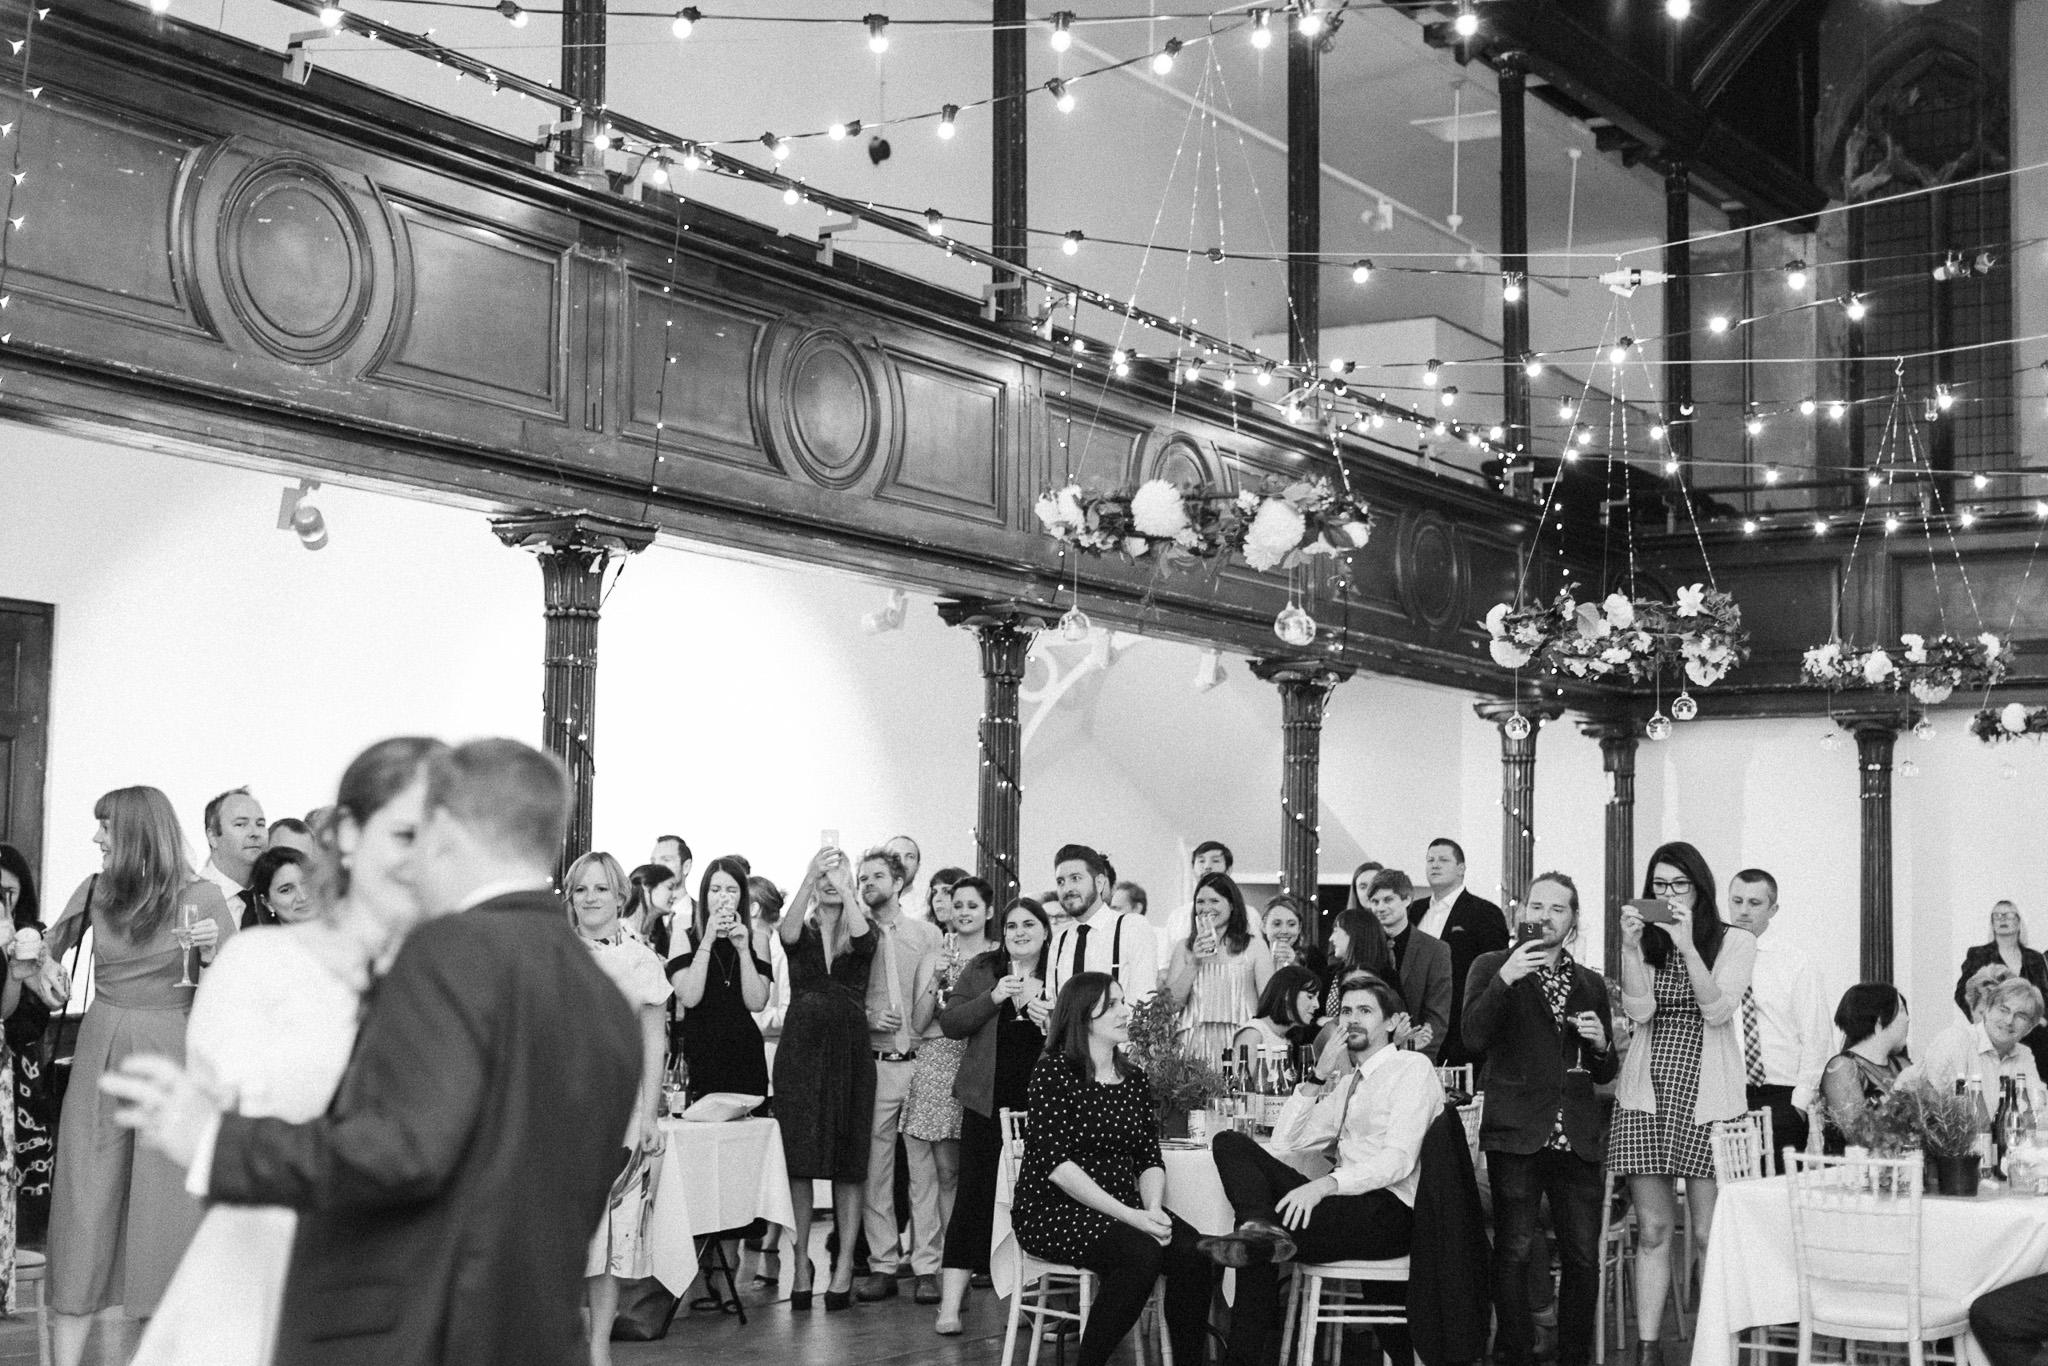 st_andrews_fabrica_brighton_wedding_622.jpg